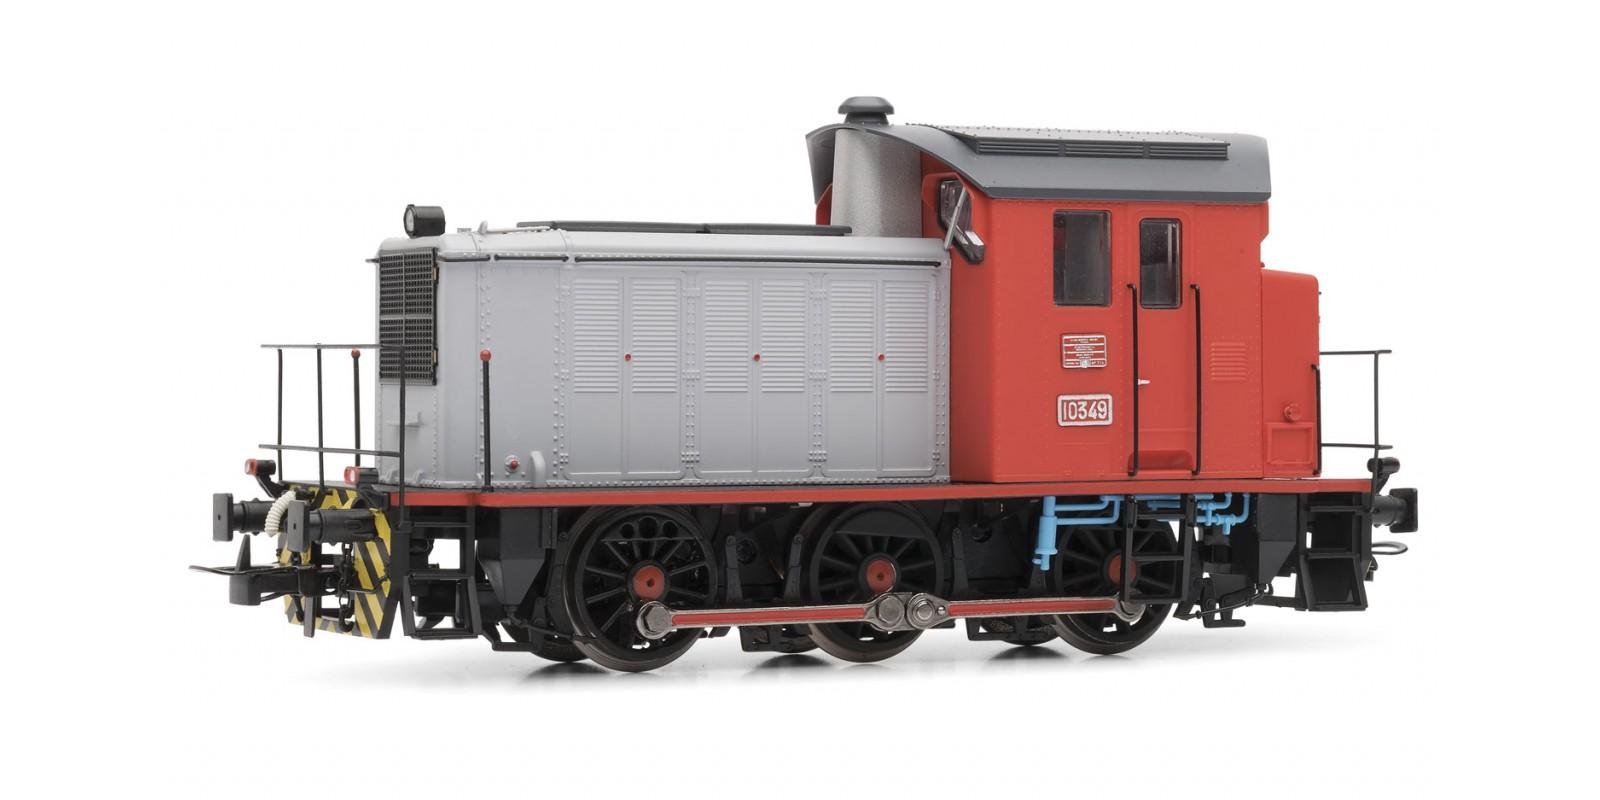 ET3814 Locomotora 303 (10349) Roja y gris